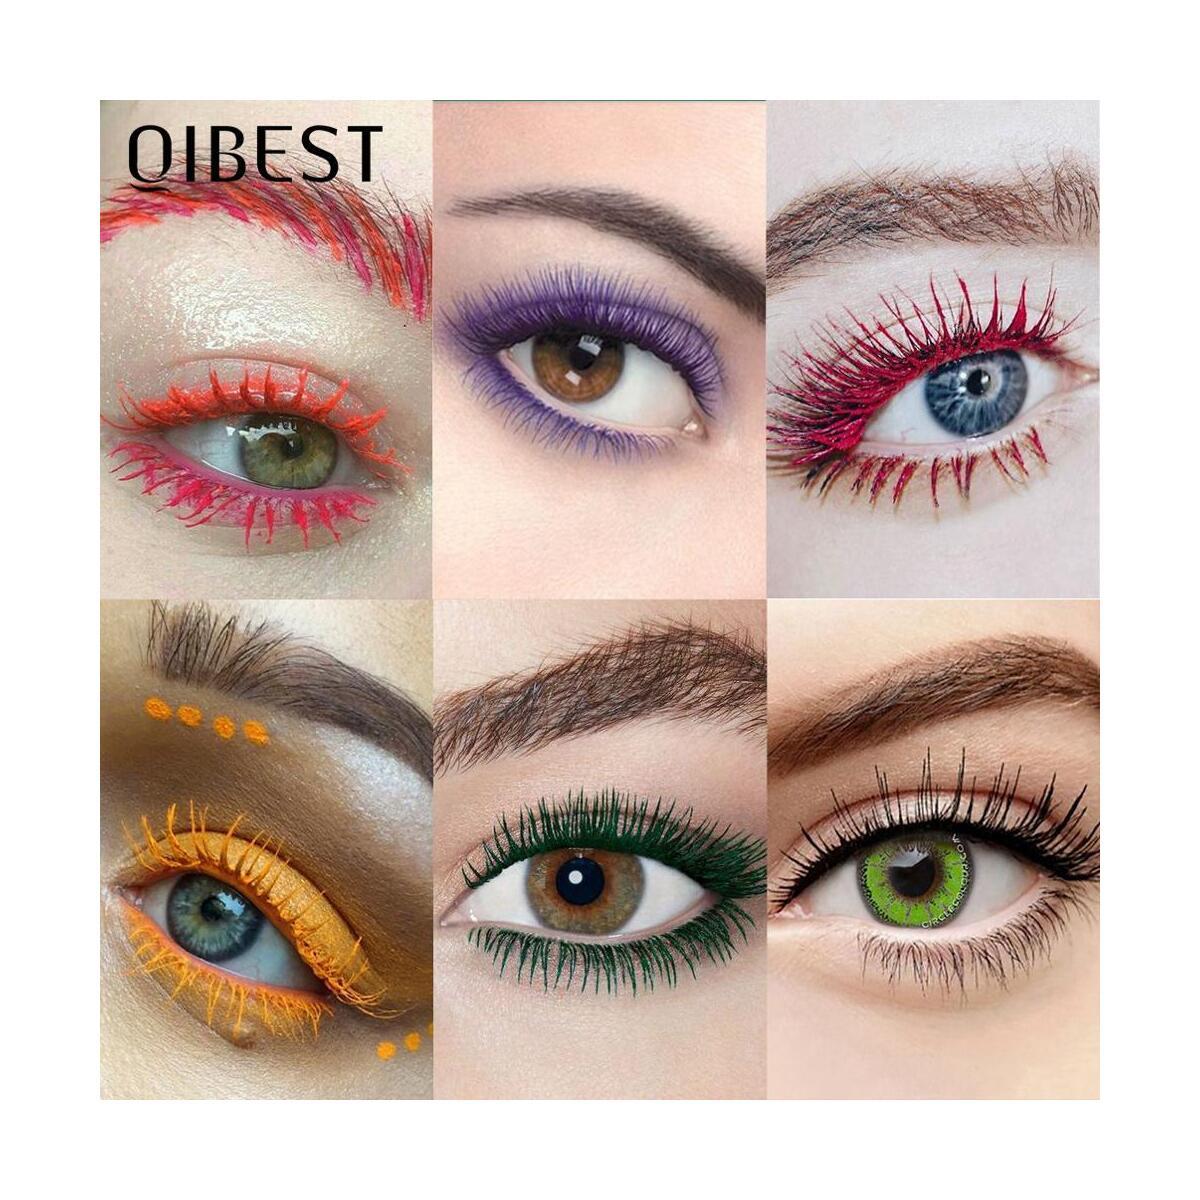 QIBEST Colorful Mascara, 1